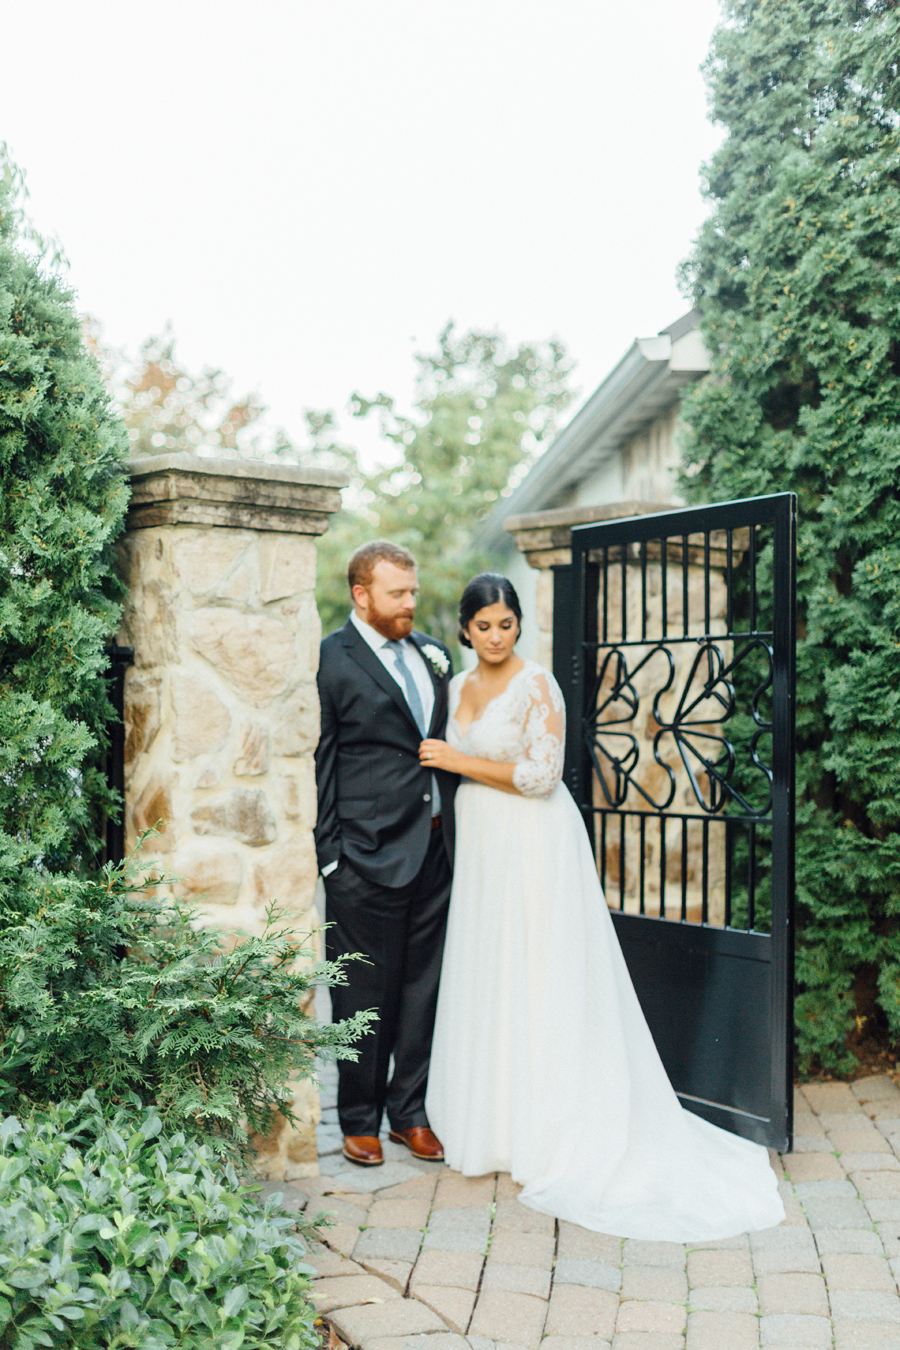 the-inn-at-leola-wedding-lancaster-pennsylvania-wedding-photographer-rebeka-viola-photograhy (97).jpg